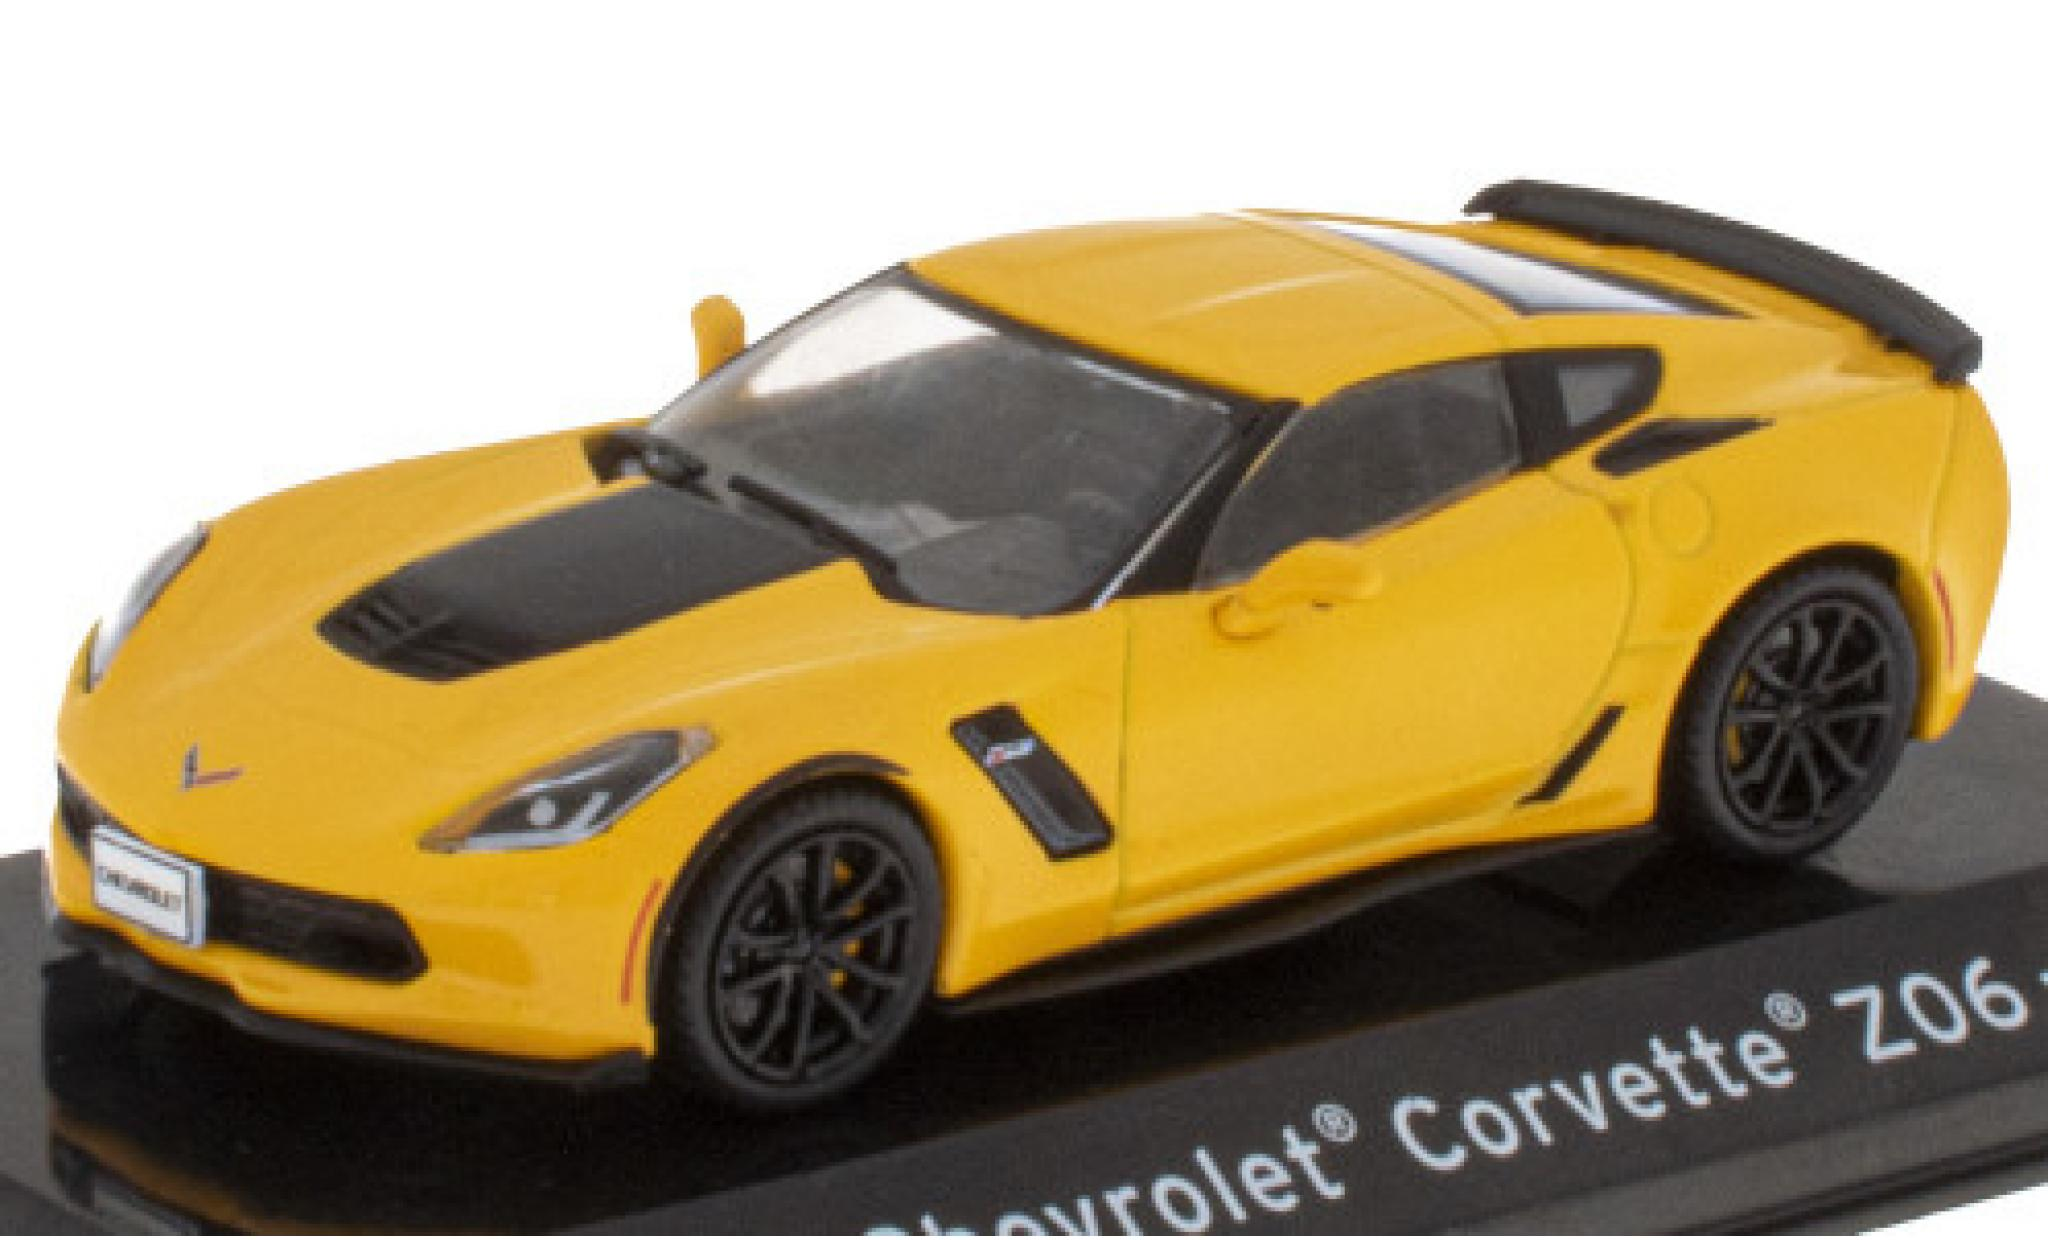 Chevrolet Corvette 1/43 SpecialC 121 Z06 (C7) yellow/matt-black 2009